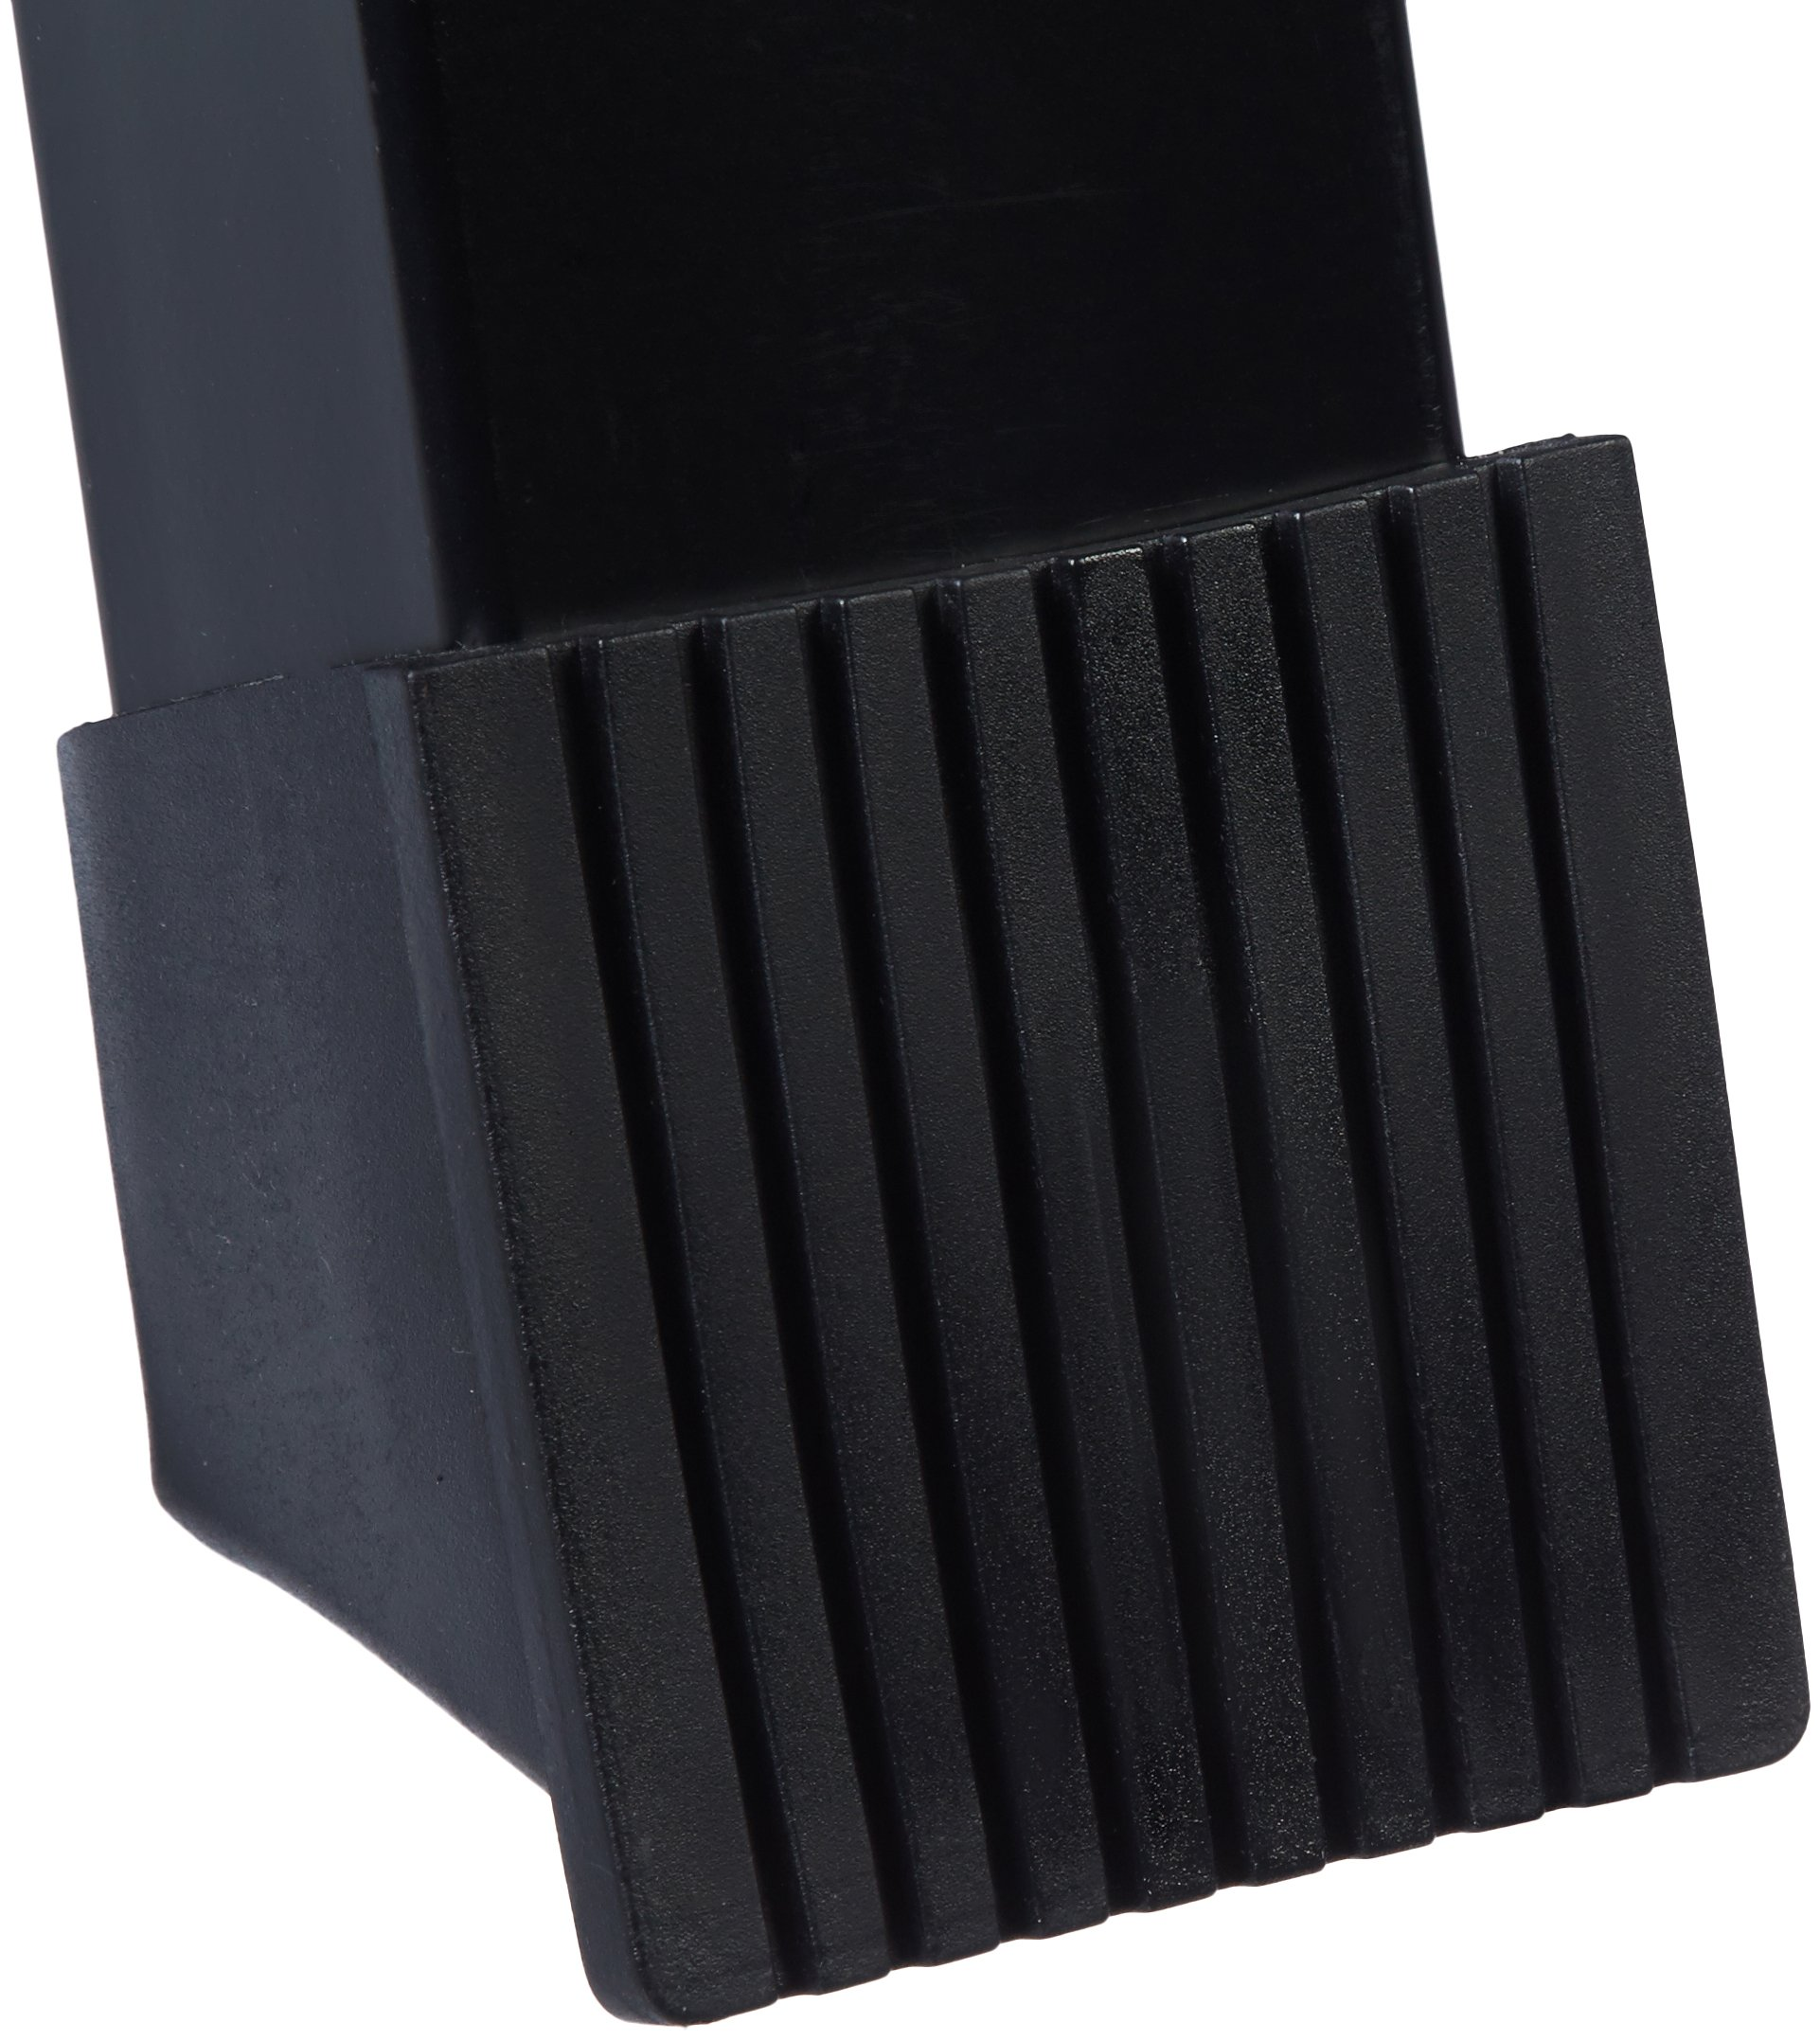 AmazonBasics Flat Weight Workout Exercise Bench 41 x 20 x 18 Inches, Black